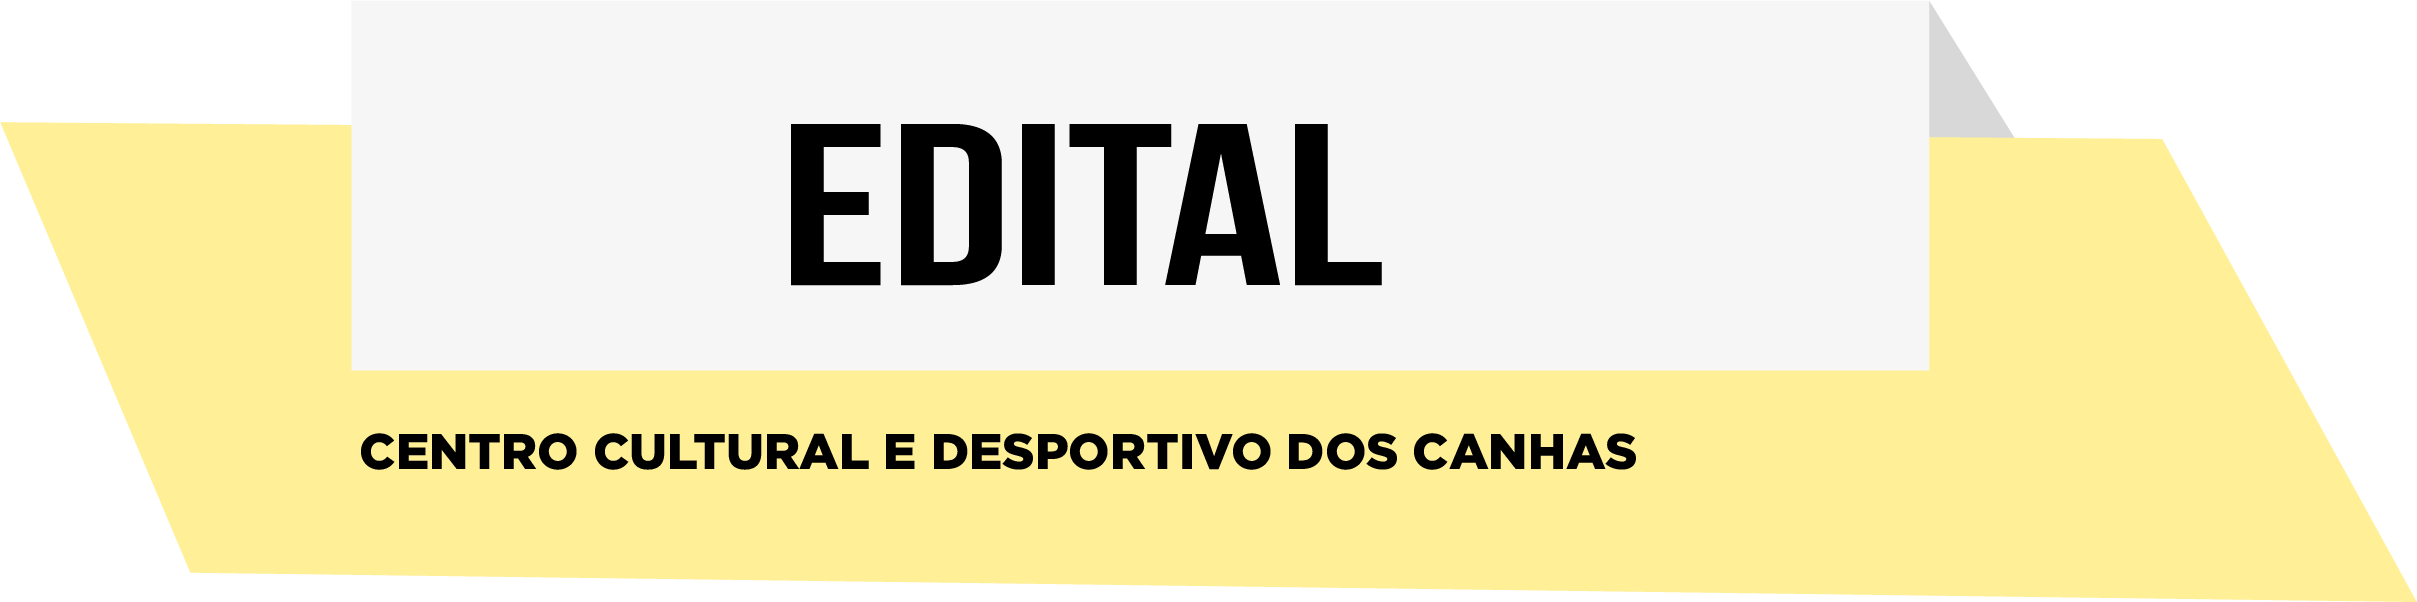 EDITAL- Centro Cultural e Desportivo dos Canhas